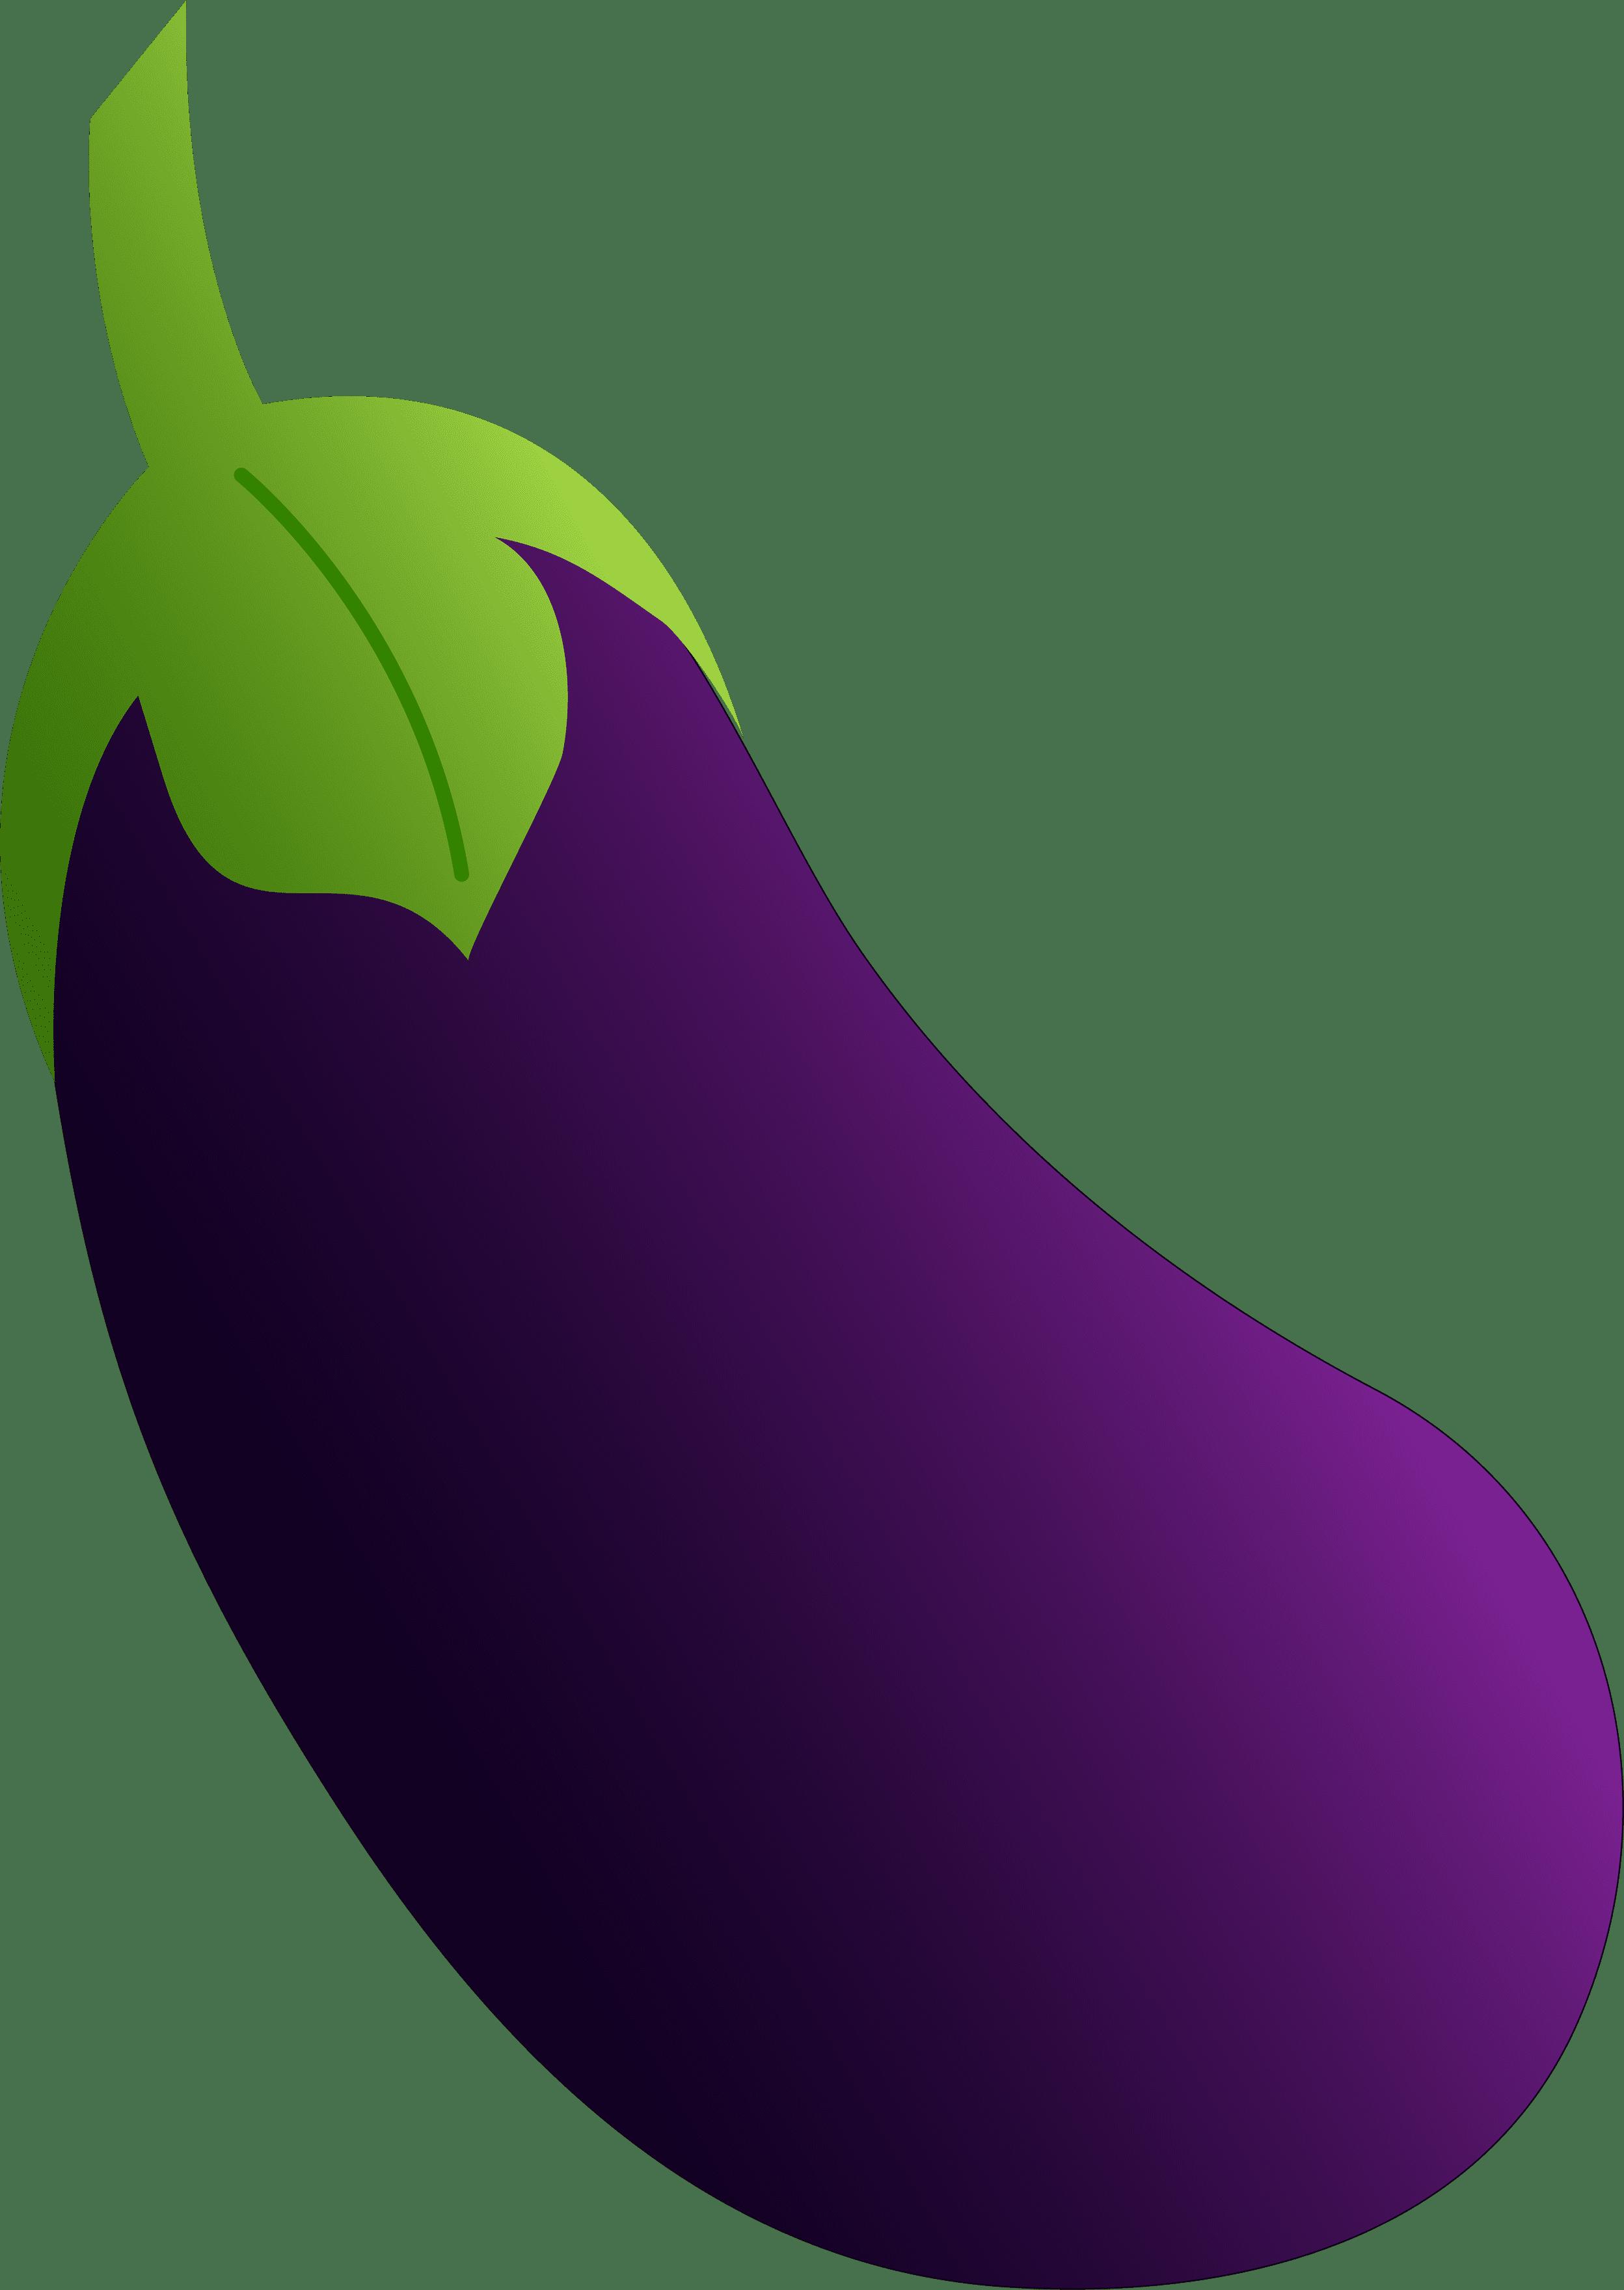 Eggplant png free images. Purple clipart brinjal